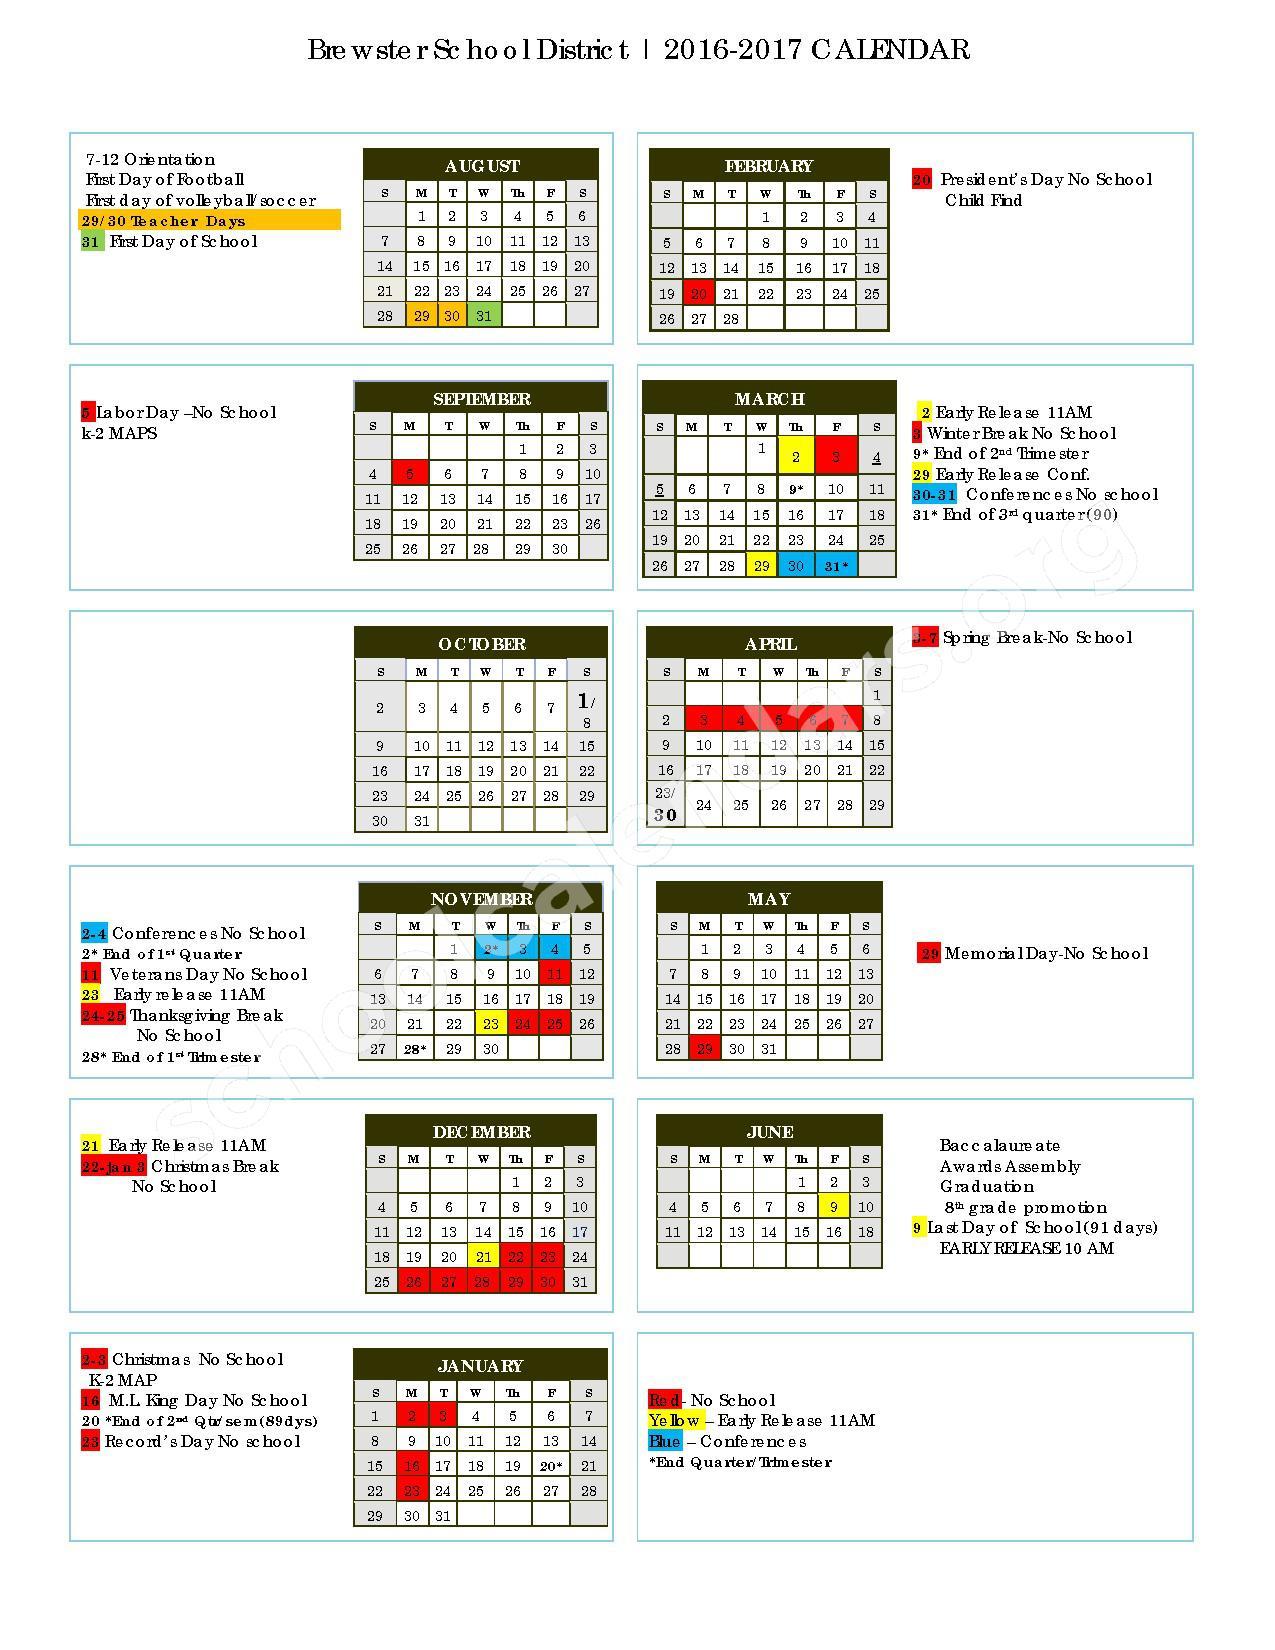 2016 - 2017 School Calendar – Brewster School District – page 1